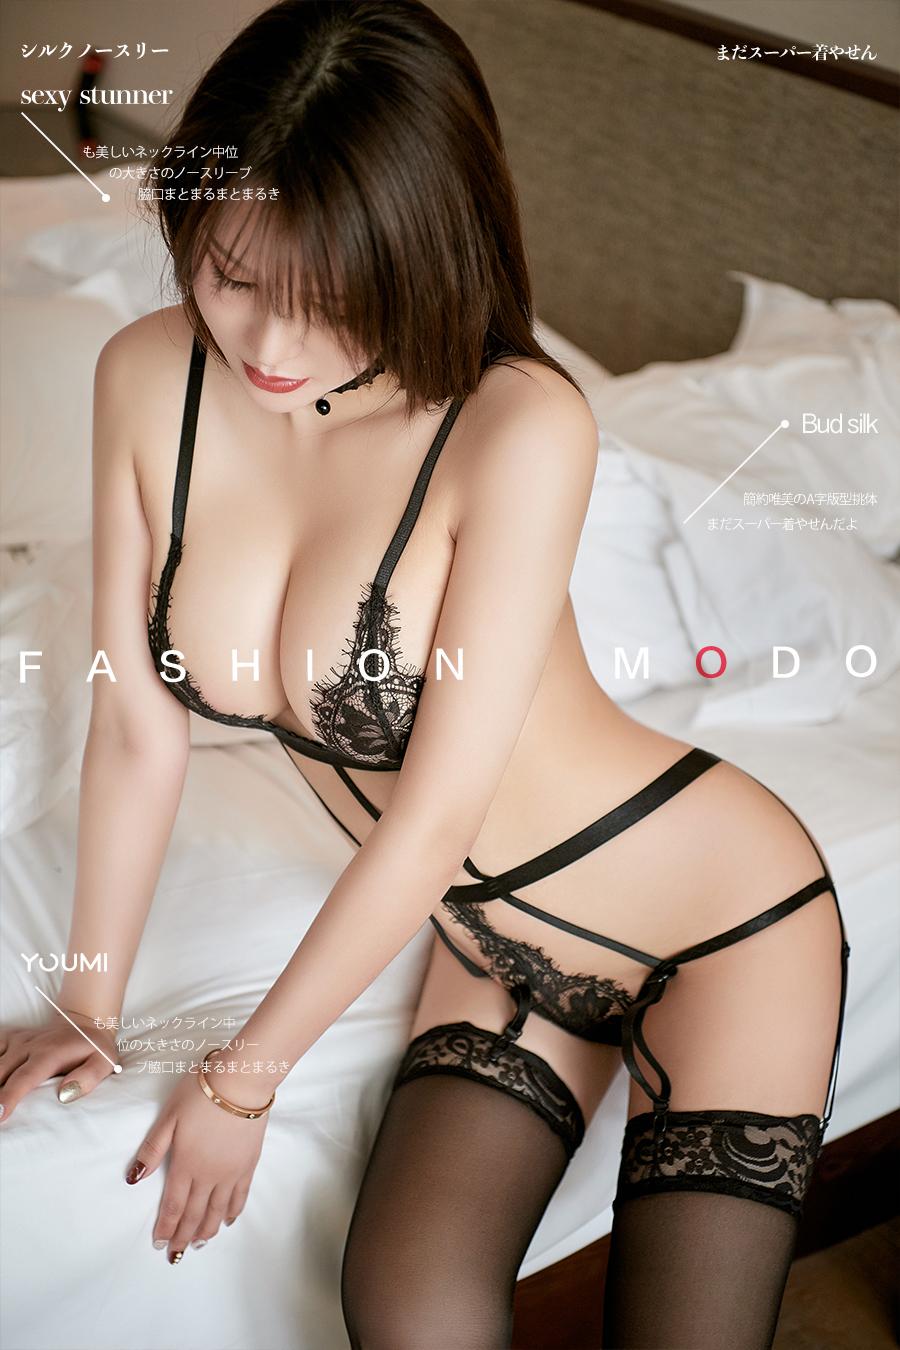 [YouMi尤蜜]2020.02.23 黑丝情人 李多多[/24MB]